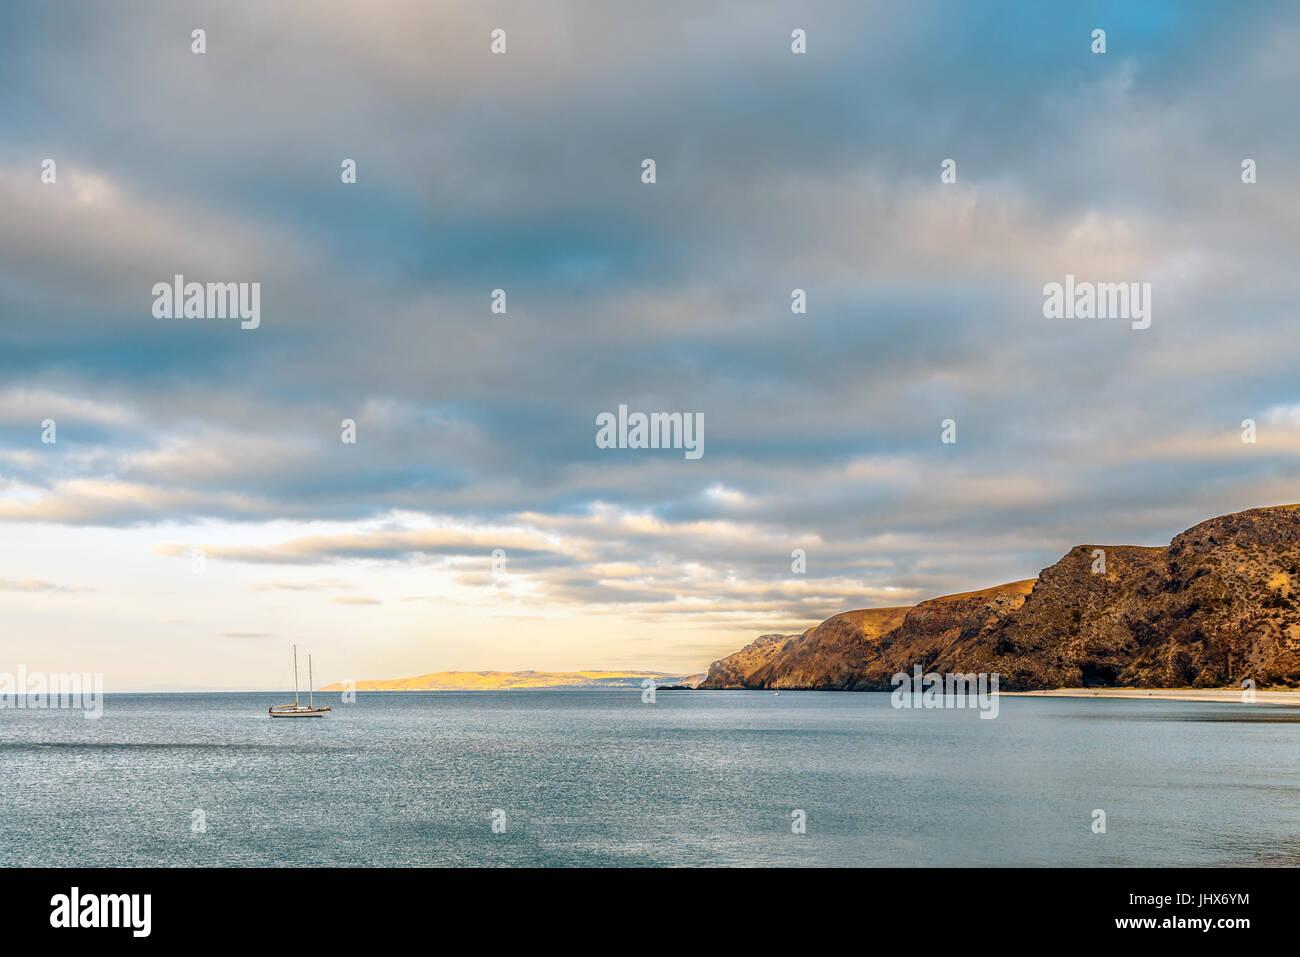 Rapid Bay minimal landscape, South Australia - Stock Image